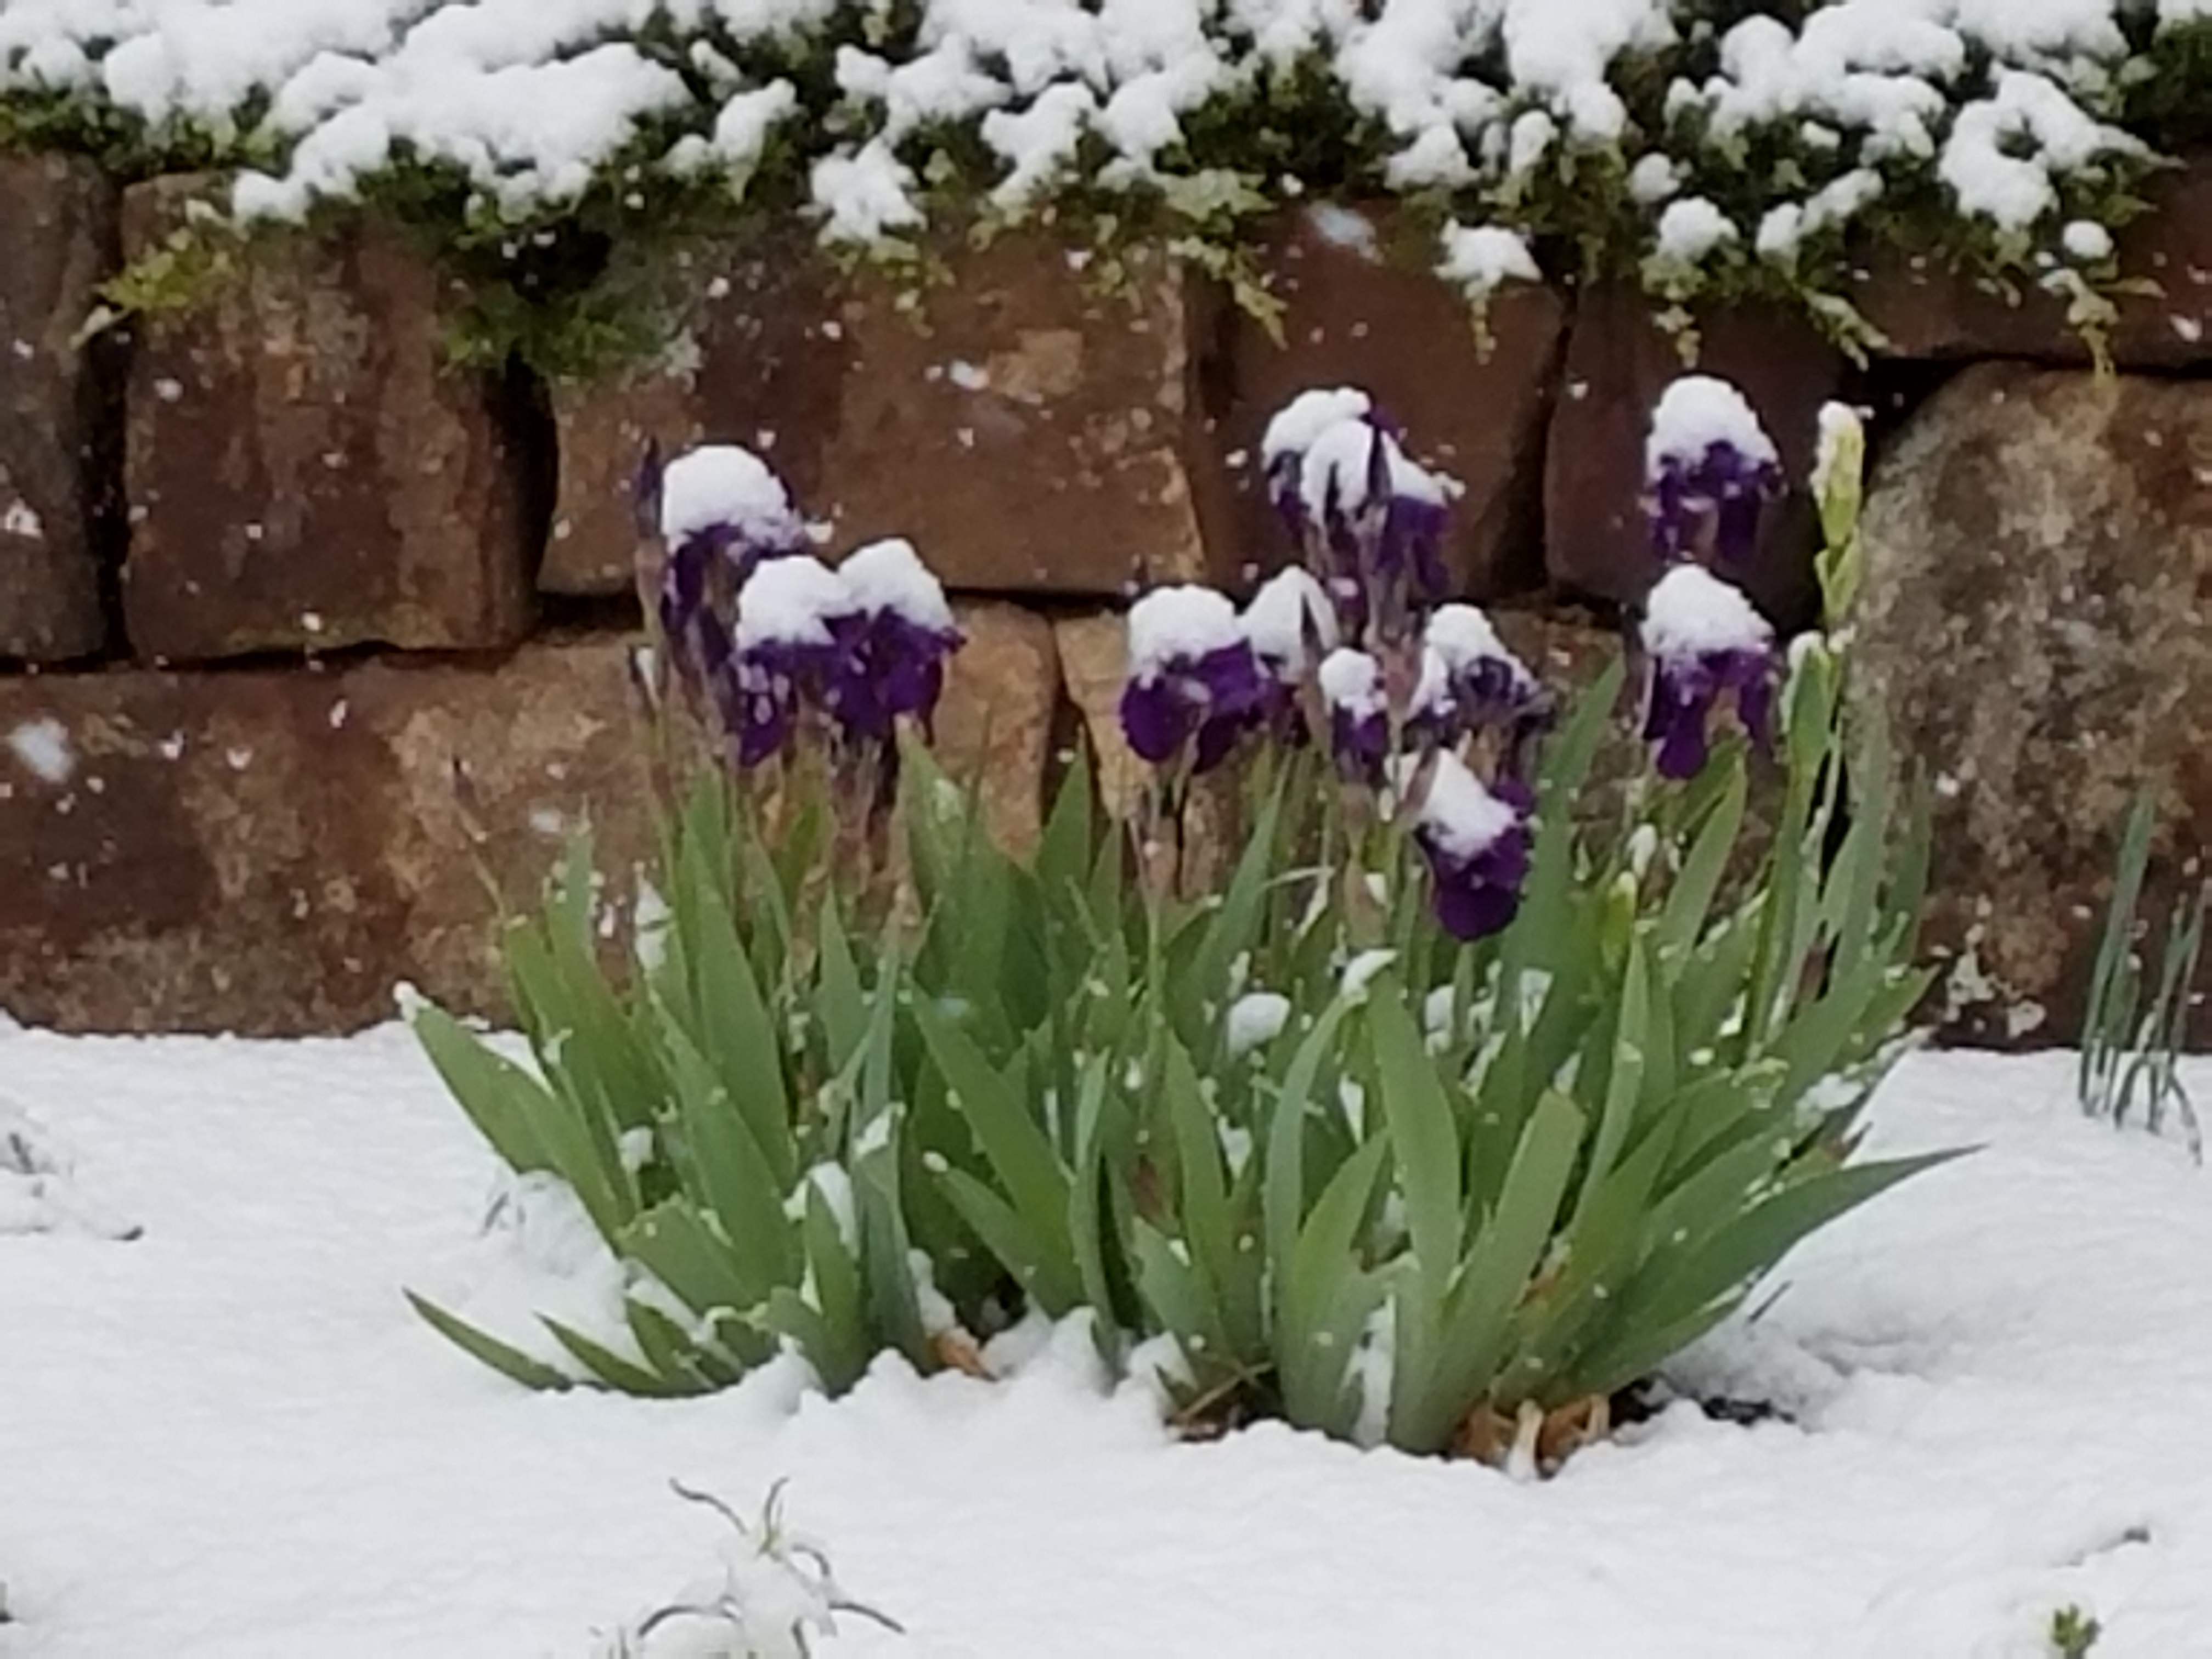 Iris in the snow